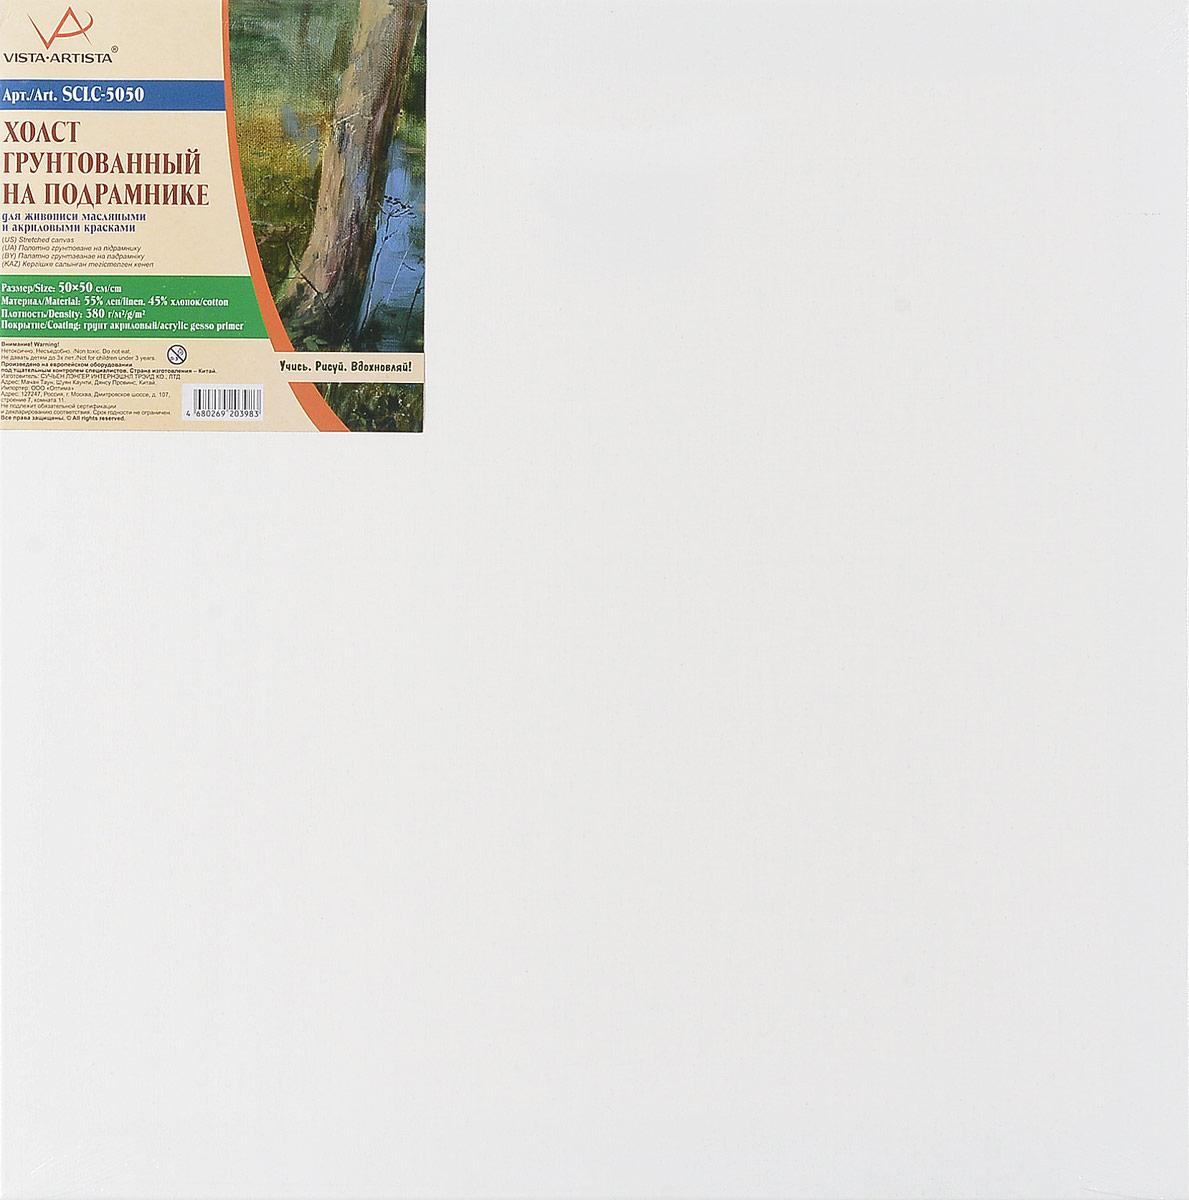 Vista-Artista Холст на подрамнике 50 см х 50 см SCLC-5050